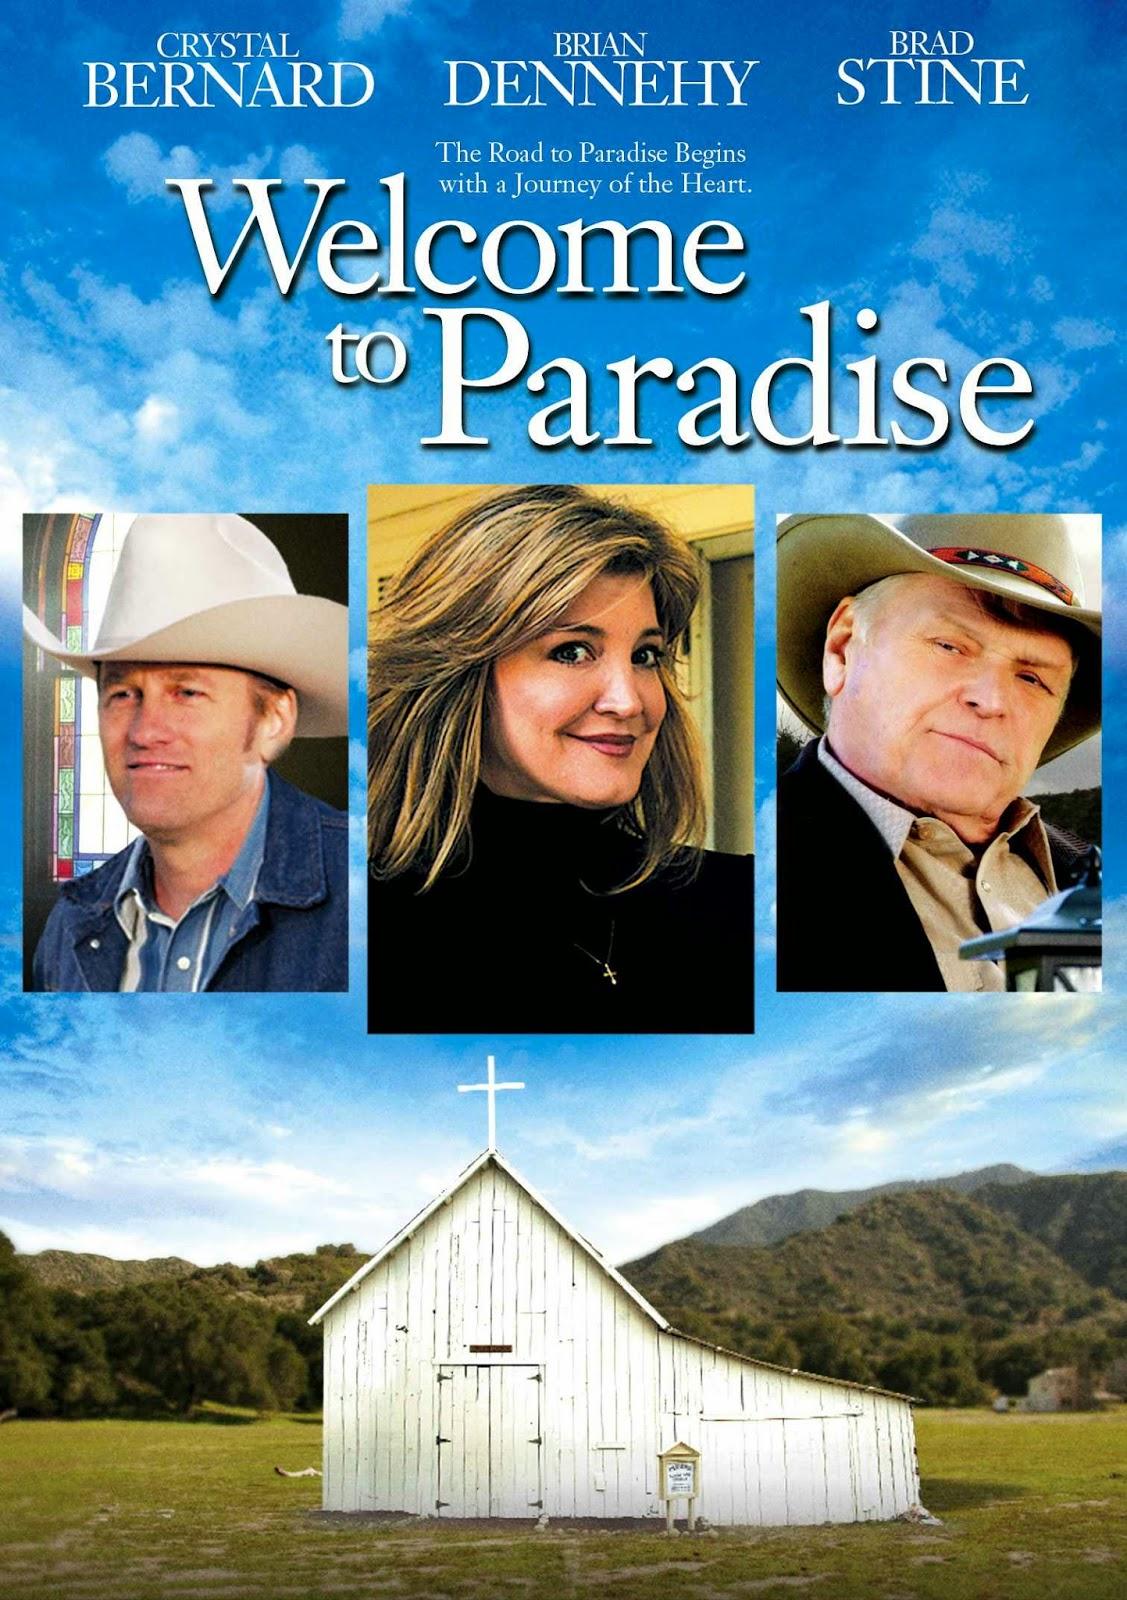 Película Cristiana WELCOME TO PARADISE....Rompiendo la Indiferencia  23uubud